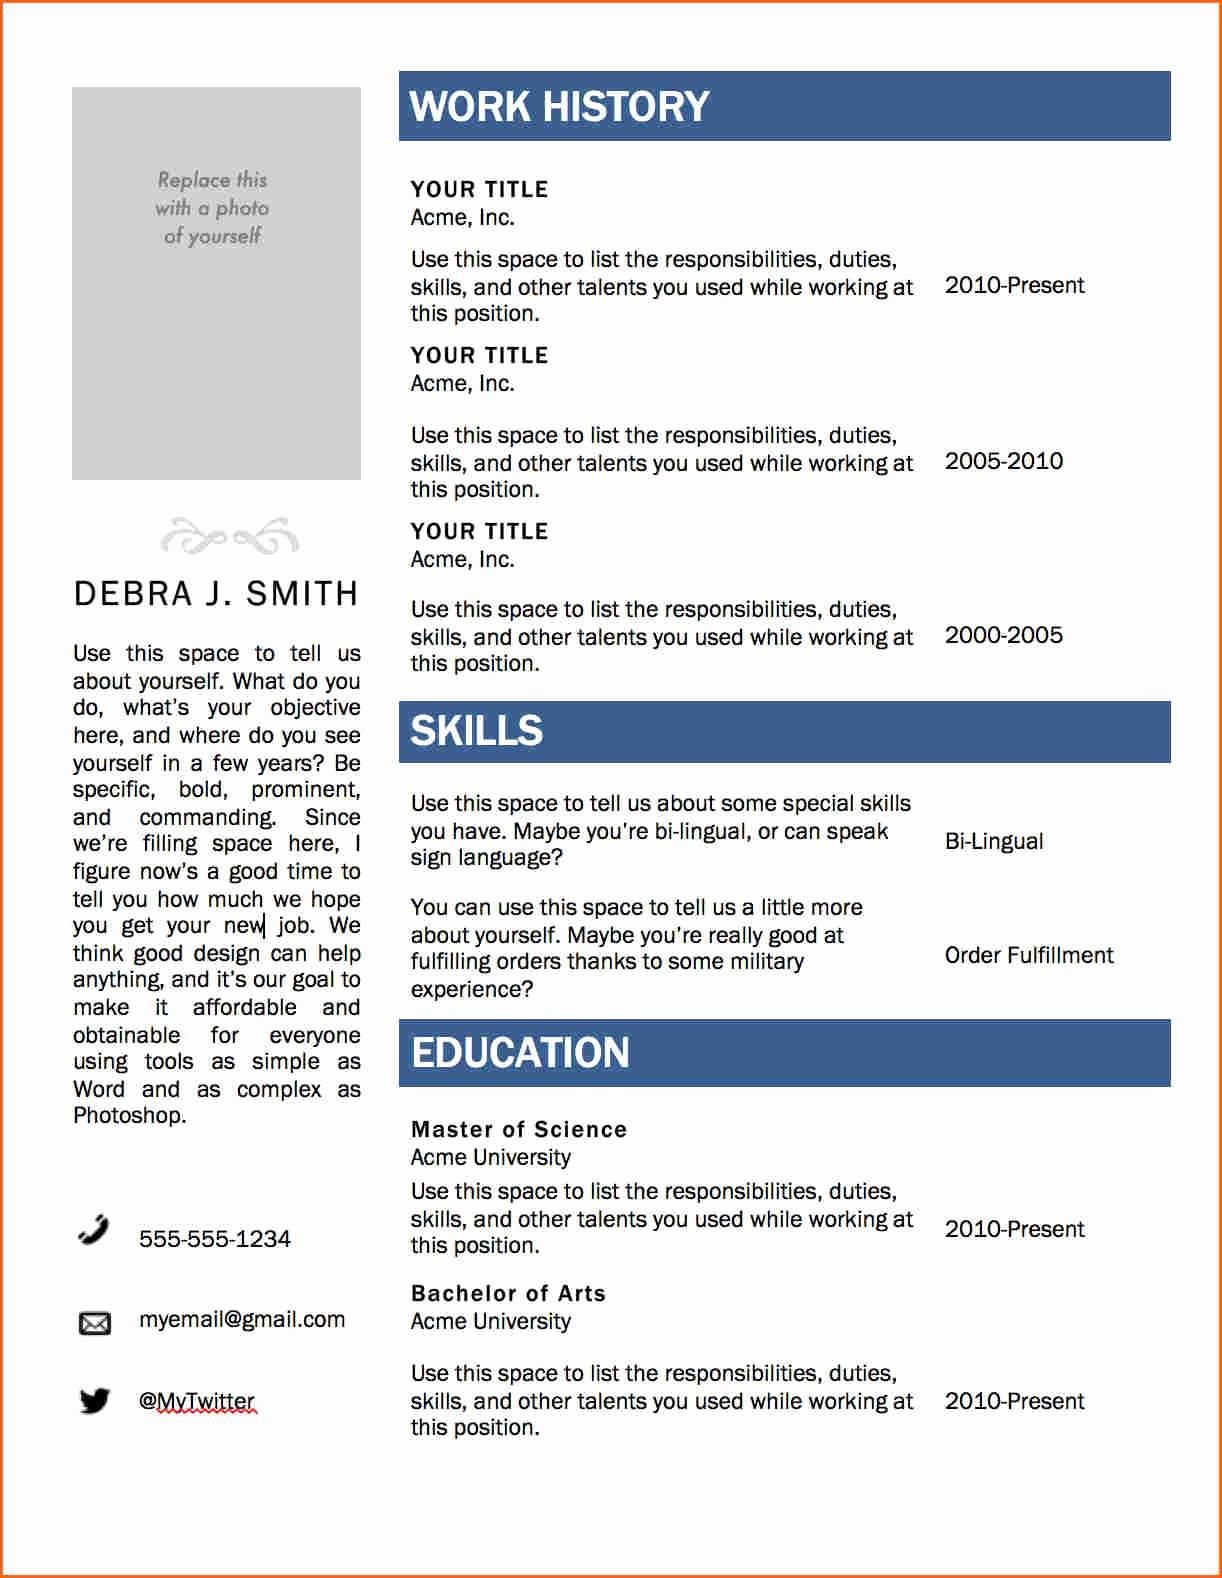 Microsoft Word Resume Templates 2007 Best Of 6 Free Resume Templates Microsoft Word 2007 Bud